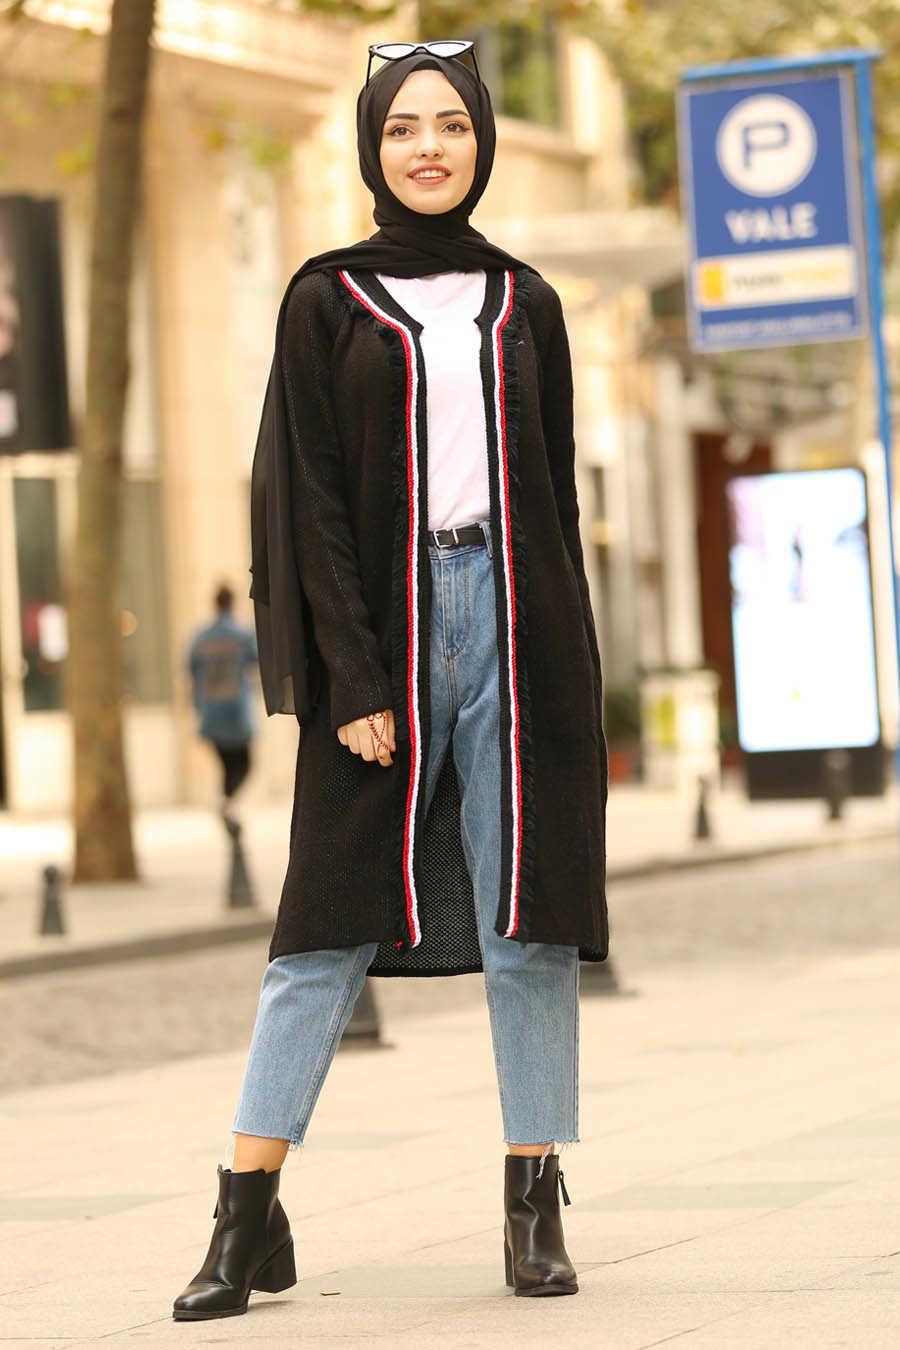 Neva Style - Black Hijab Cardigan 4279S